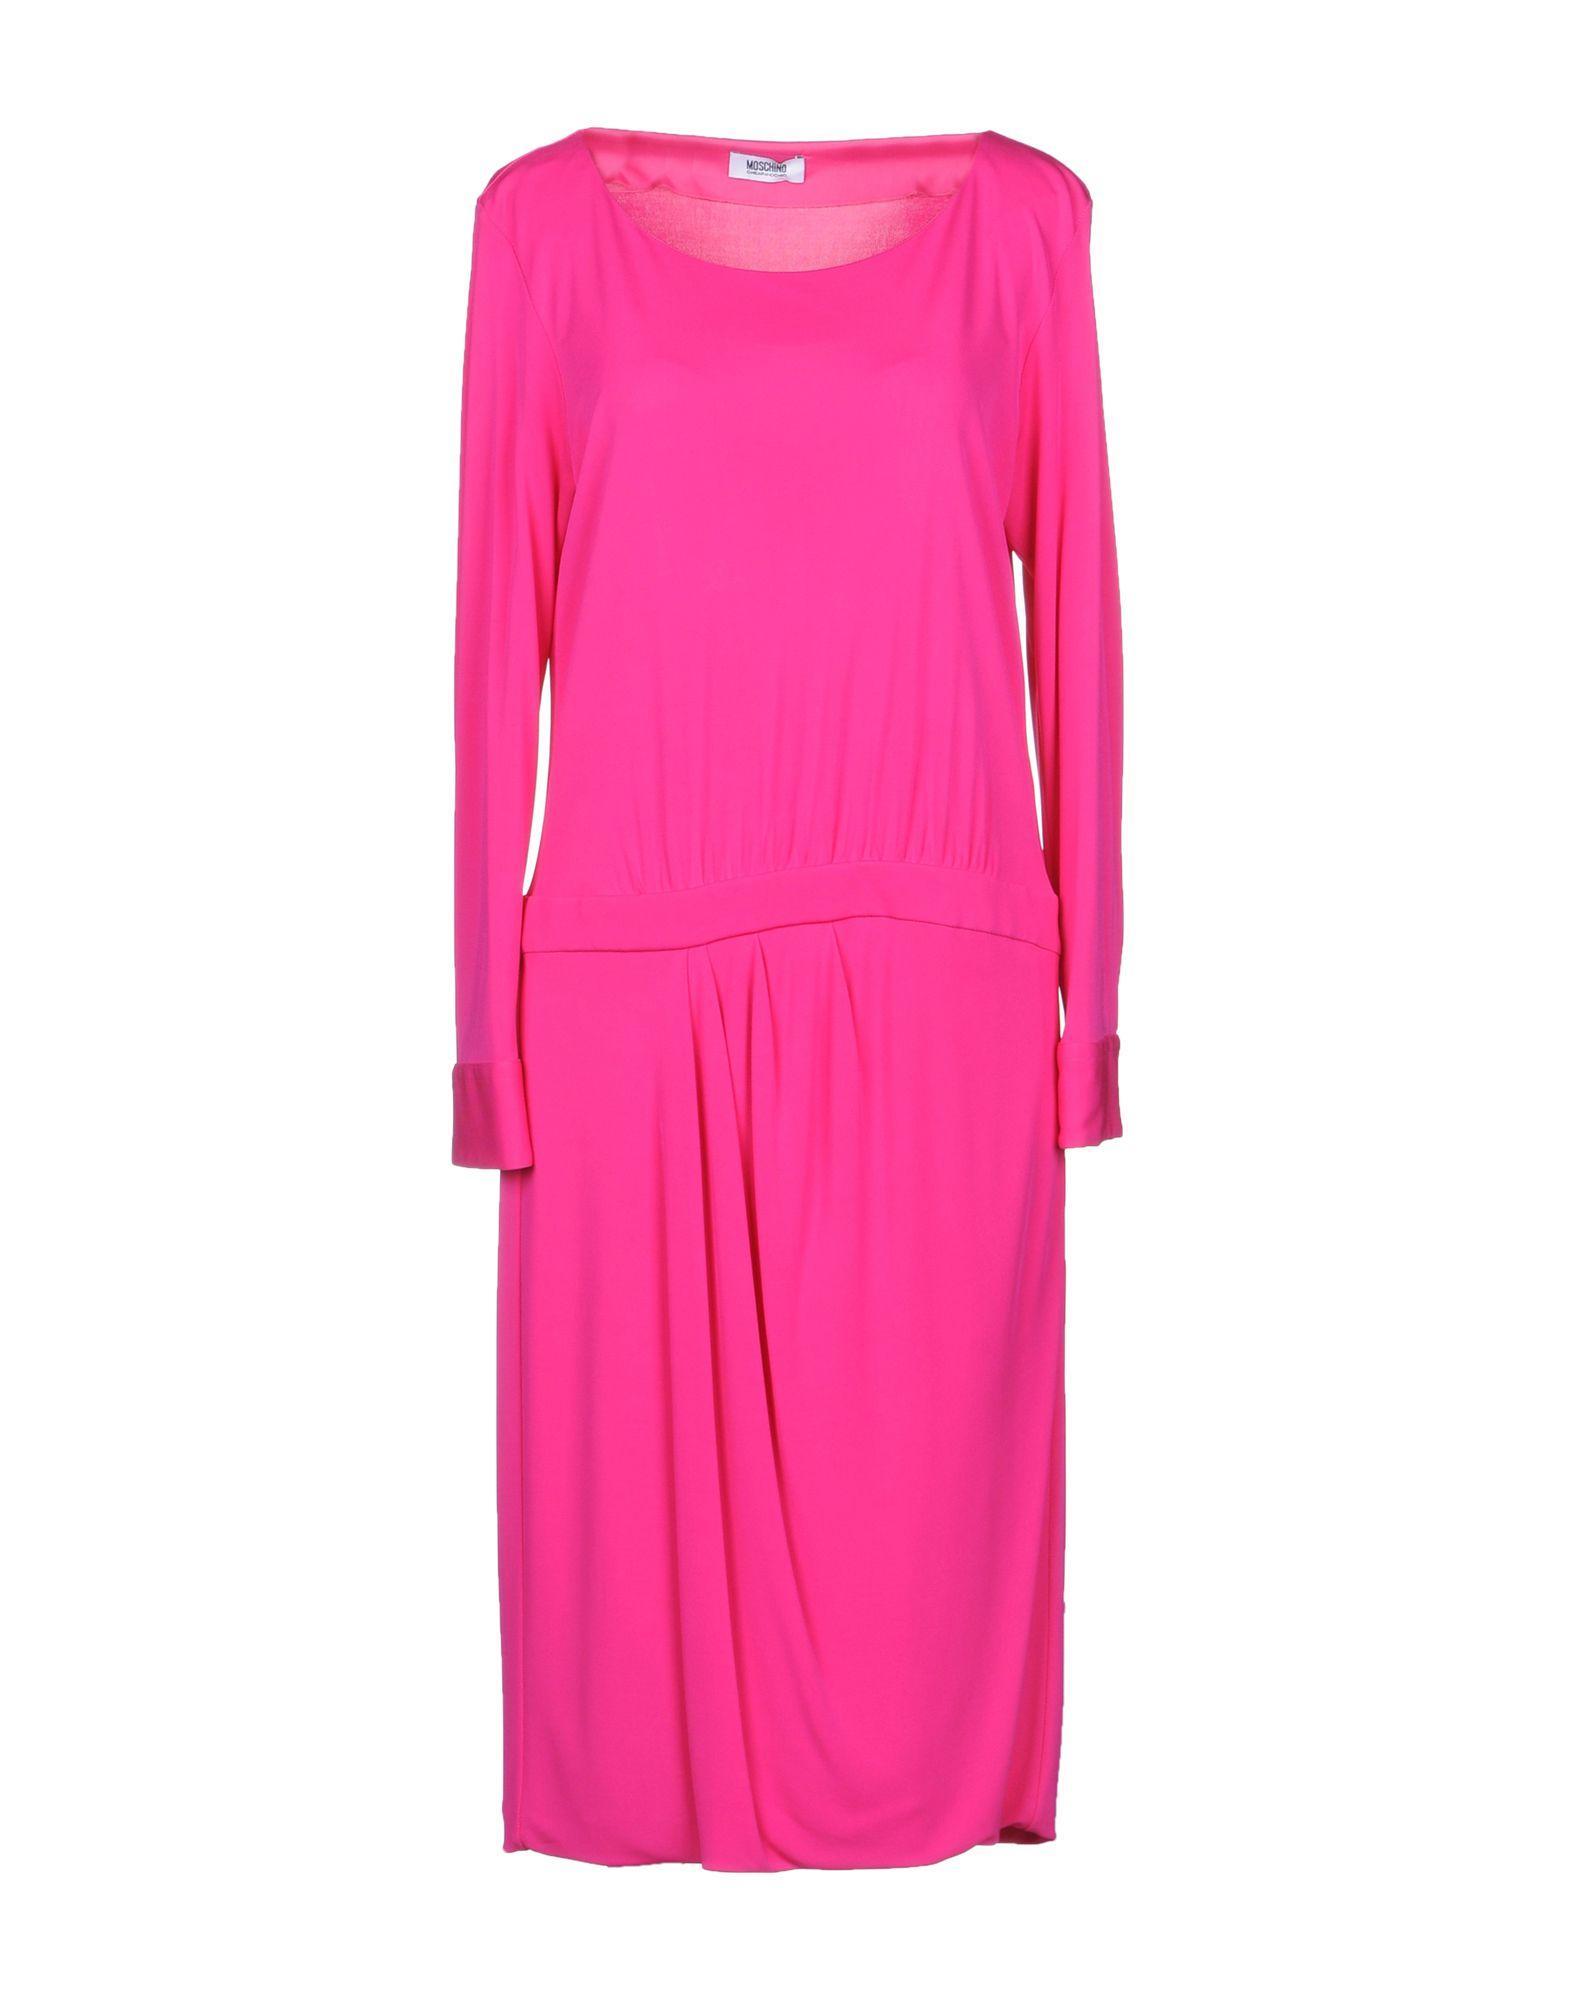 Moschino Cheap And Chic Knee-length Dress In Fuchsia